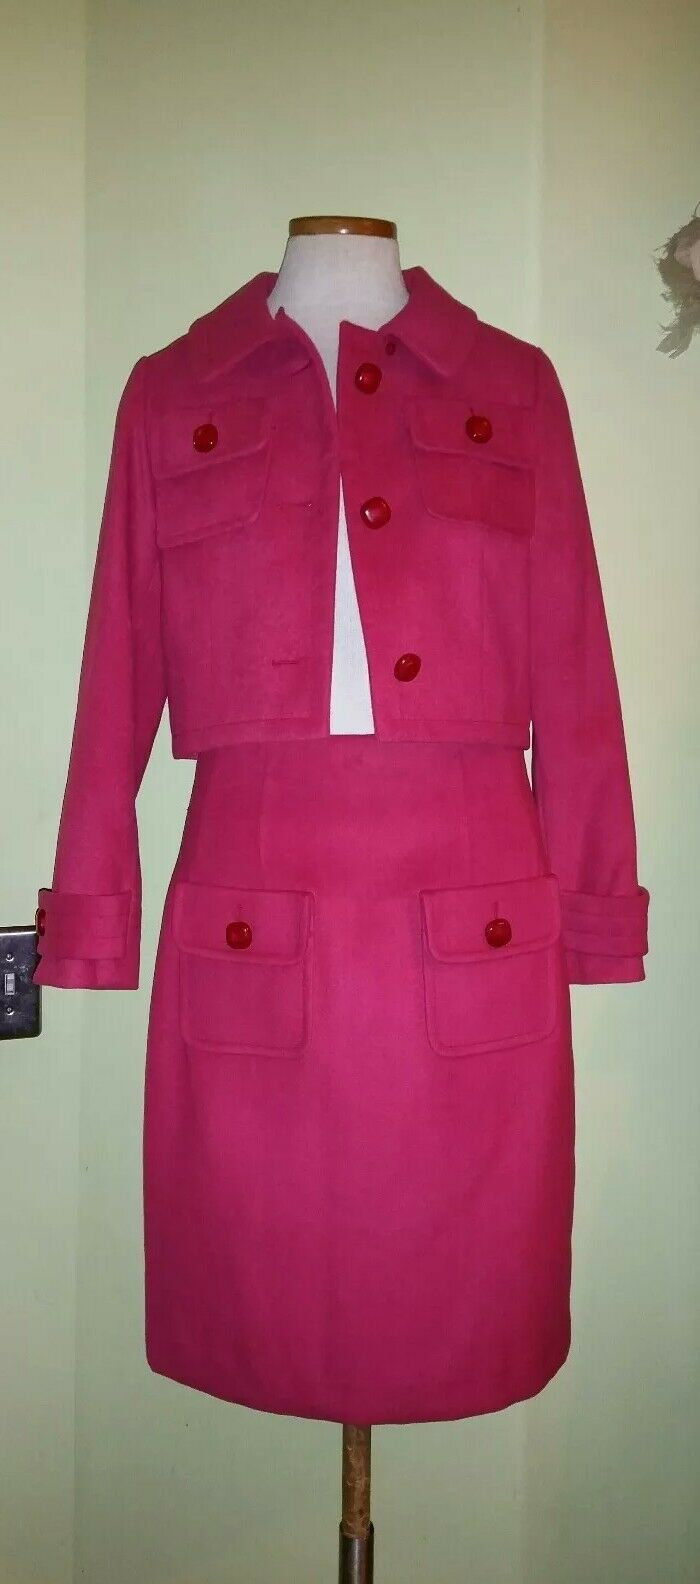 ETCETERA Hot Pink Suit Sz 4 NWOT Stunning    Retail  & up